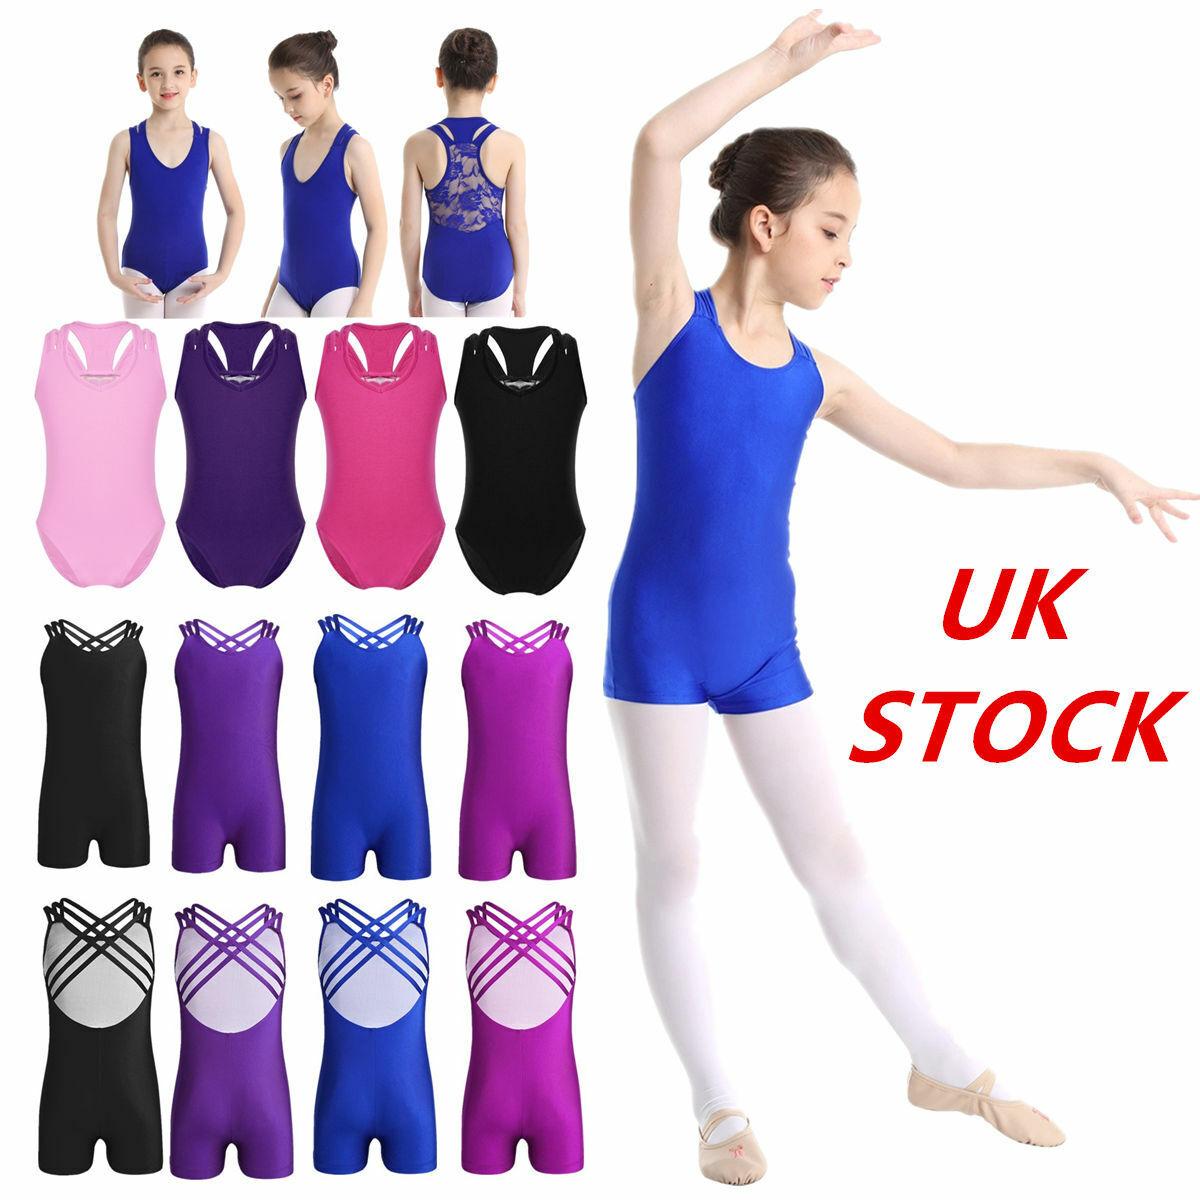 UK Girls Gymnastic Ballet Leotards Bodysuits Dancewear Stretchy Unitards Costume